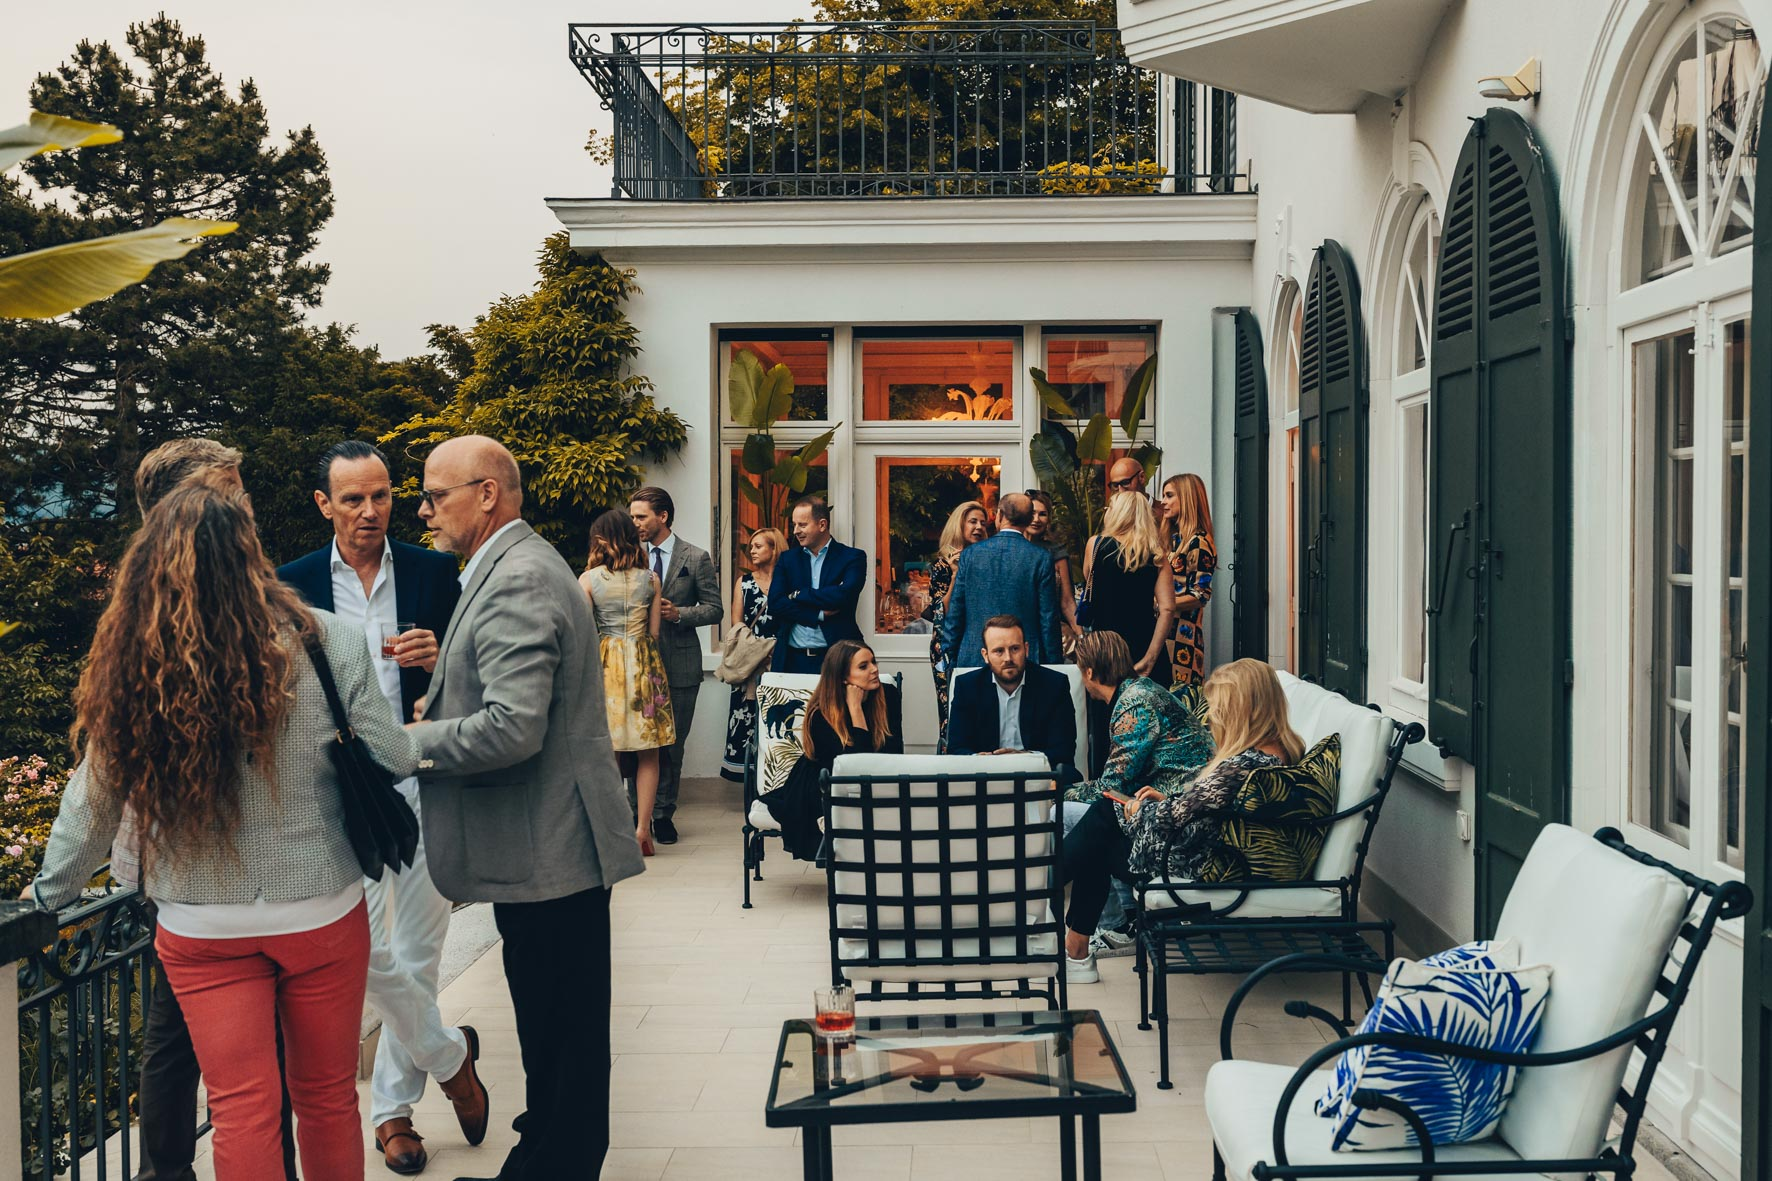 Konrad-lifestyle-art-basel-%22gold-member-experience%22-2019-80.jpg